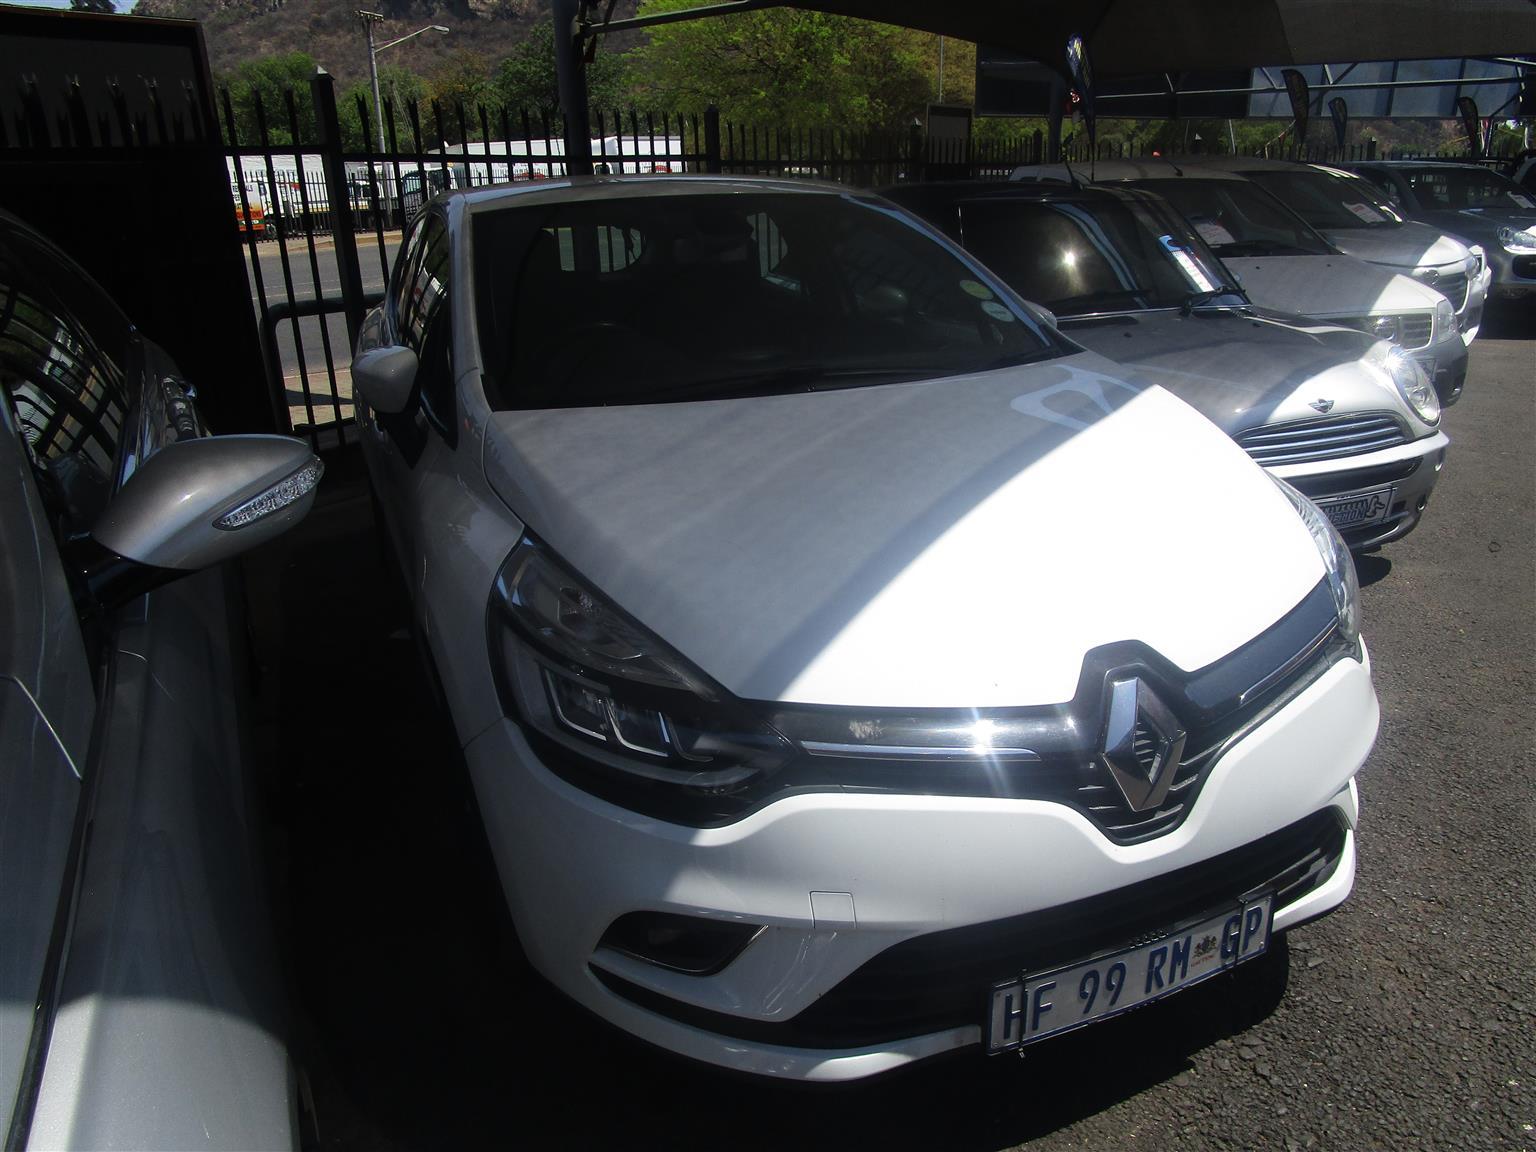 2016 Renault Clio 1.4 Expression 3 door